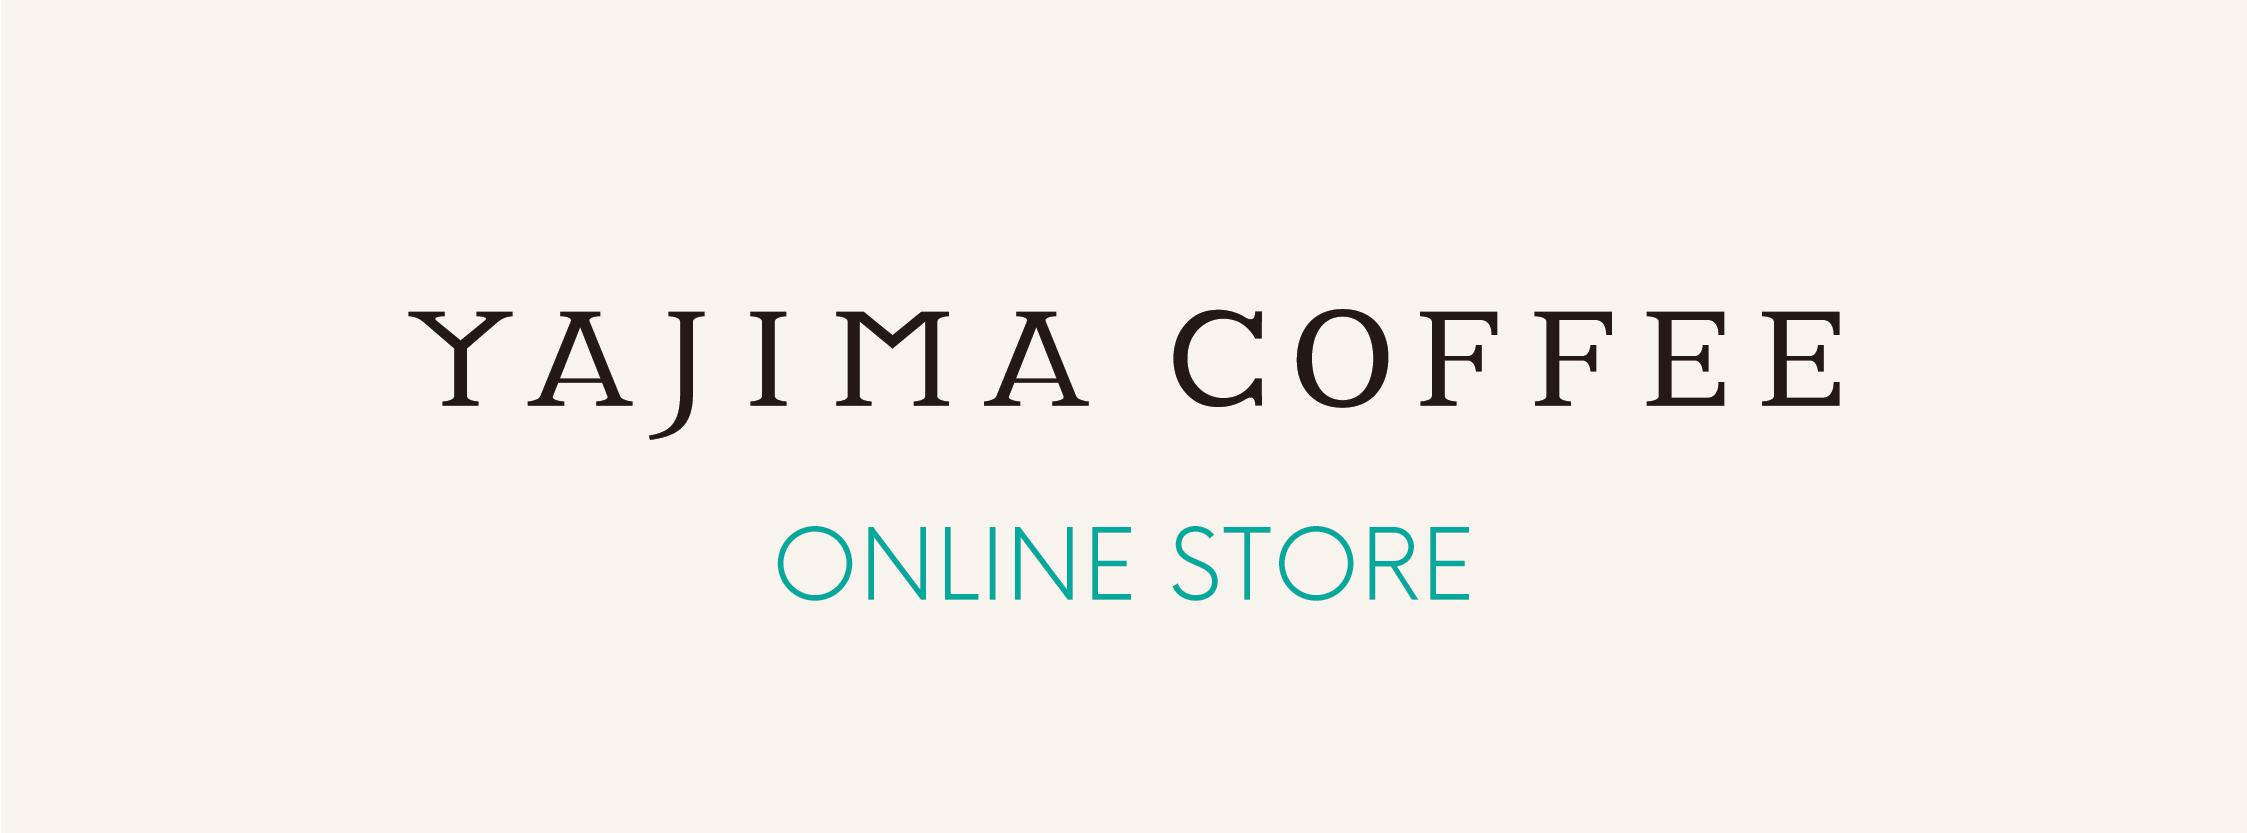 yajimacoffee